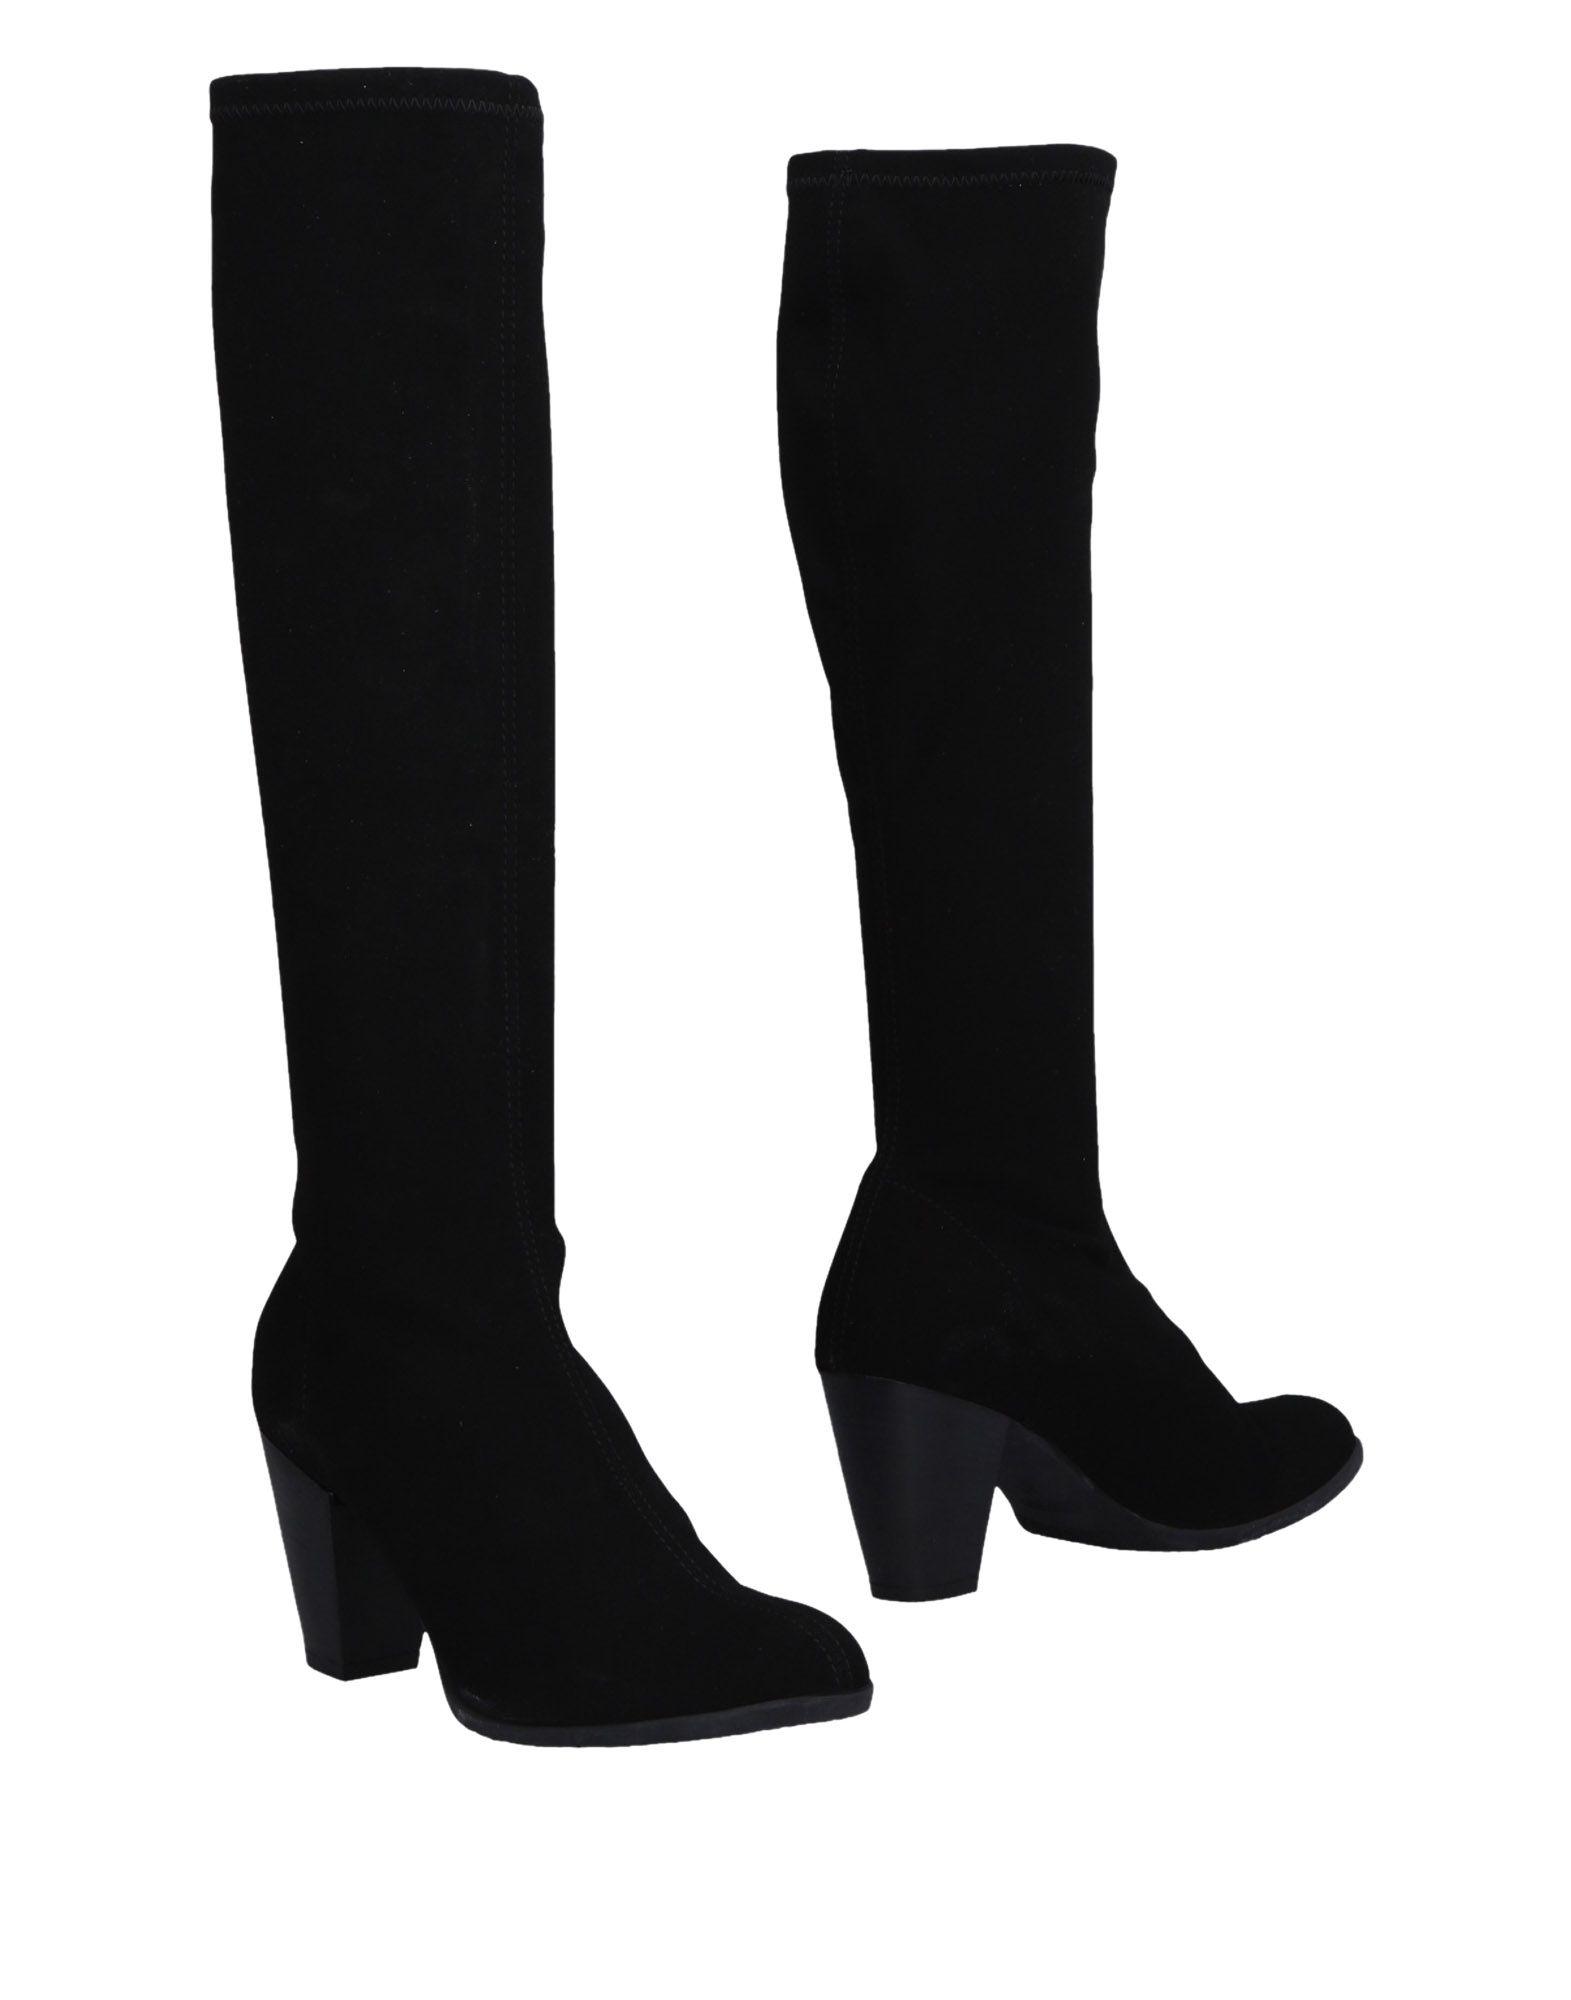 Nila & Nila Stiefel beliebte Damen  11475071EB Gute Qualität beliebte Stiefel Schuhe 481c94